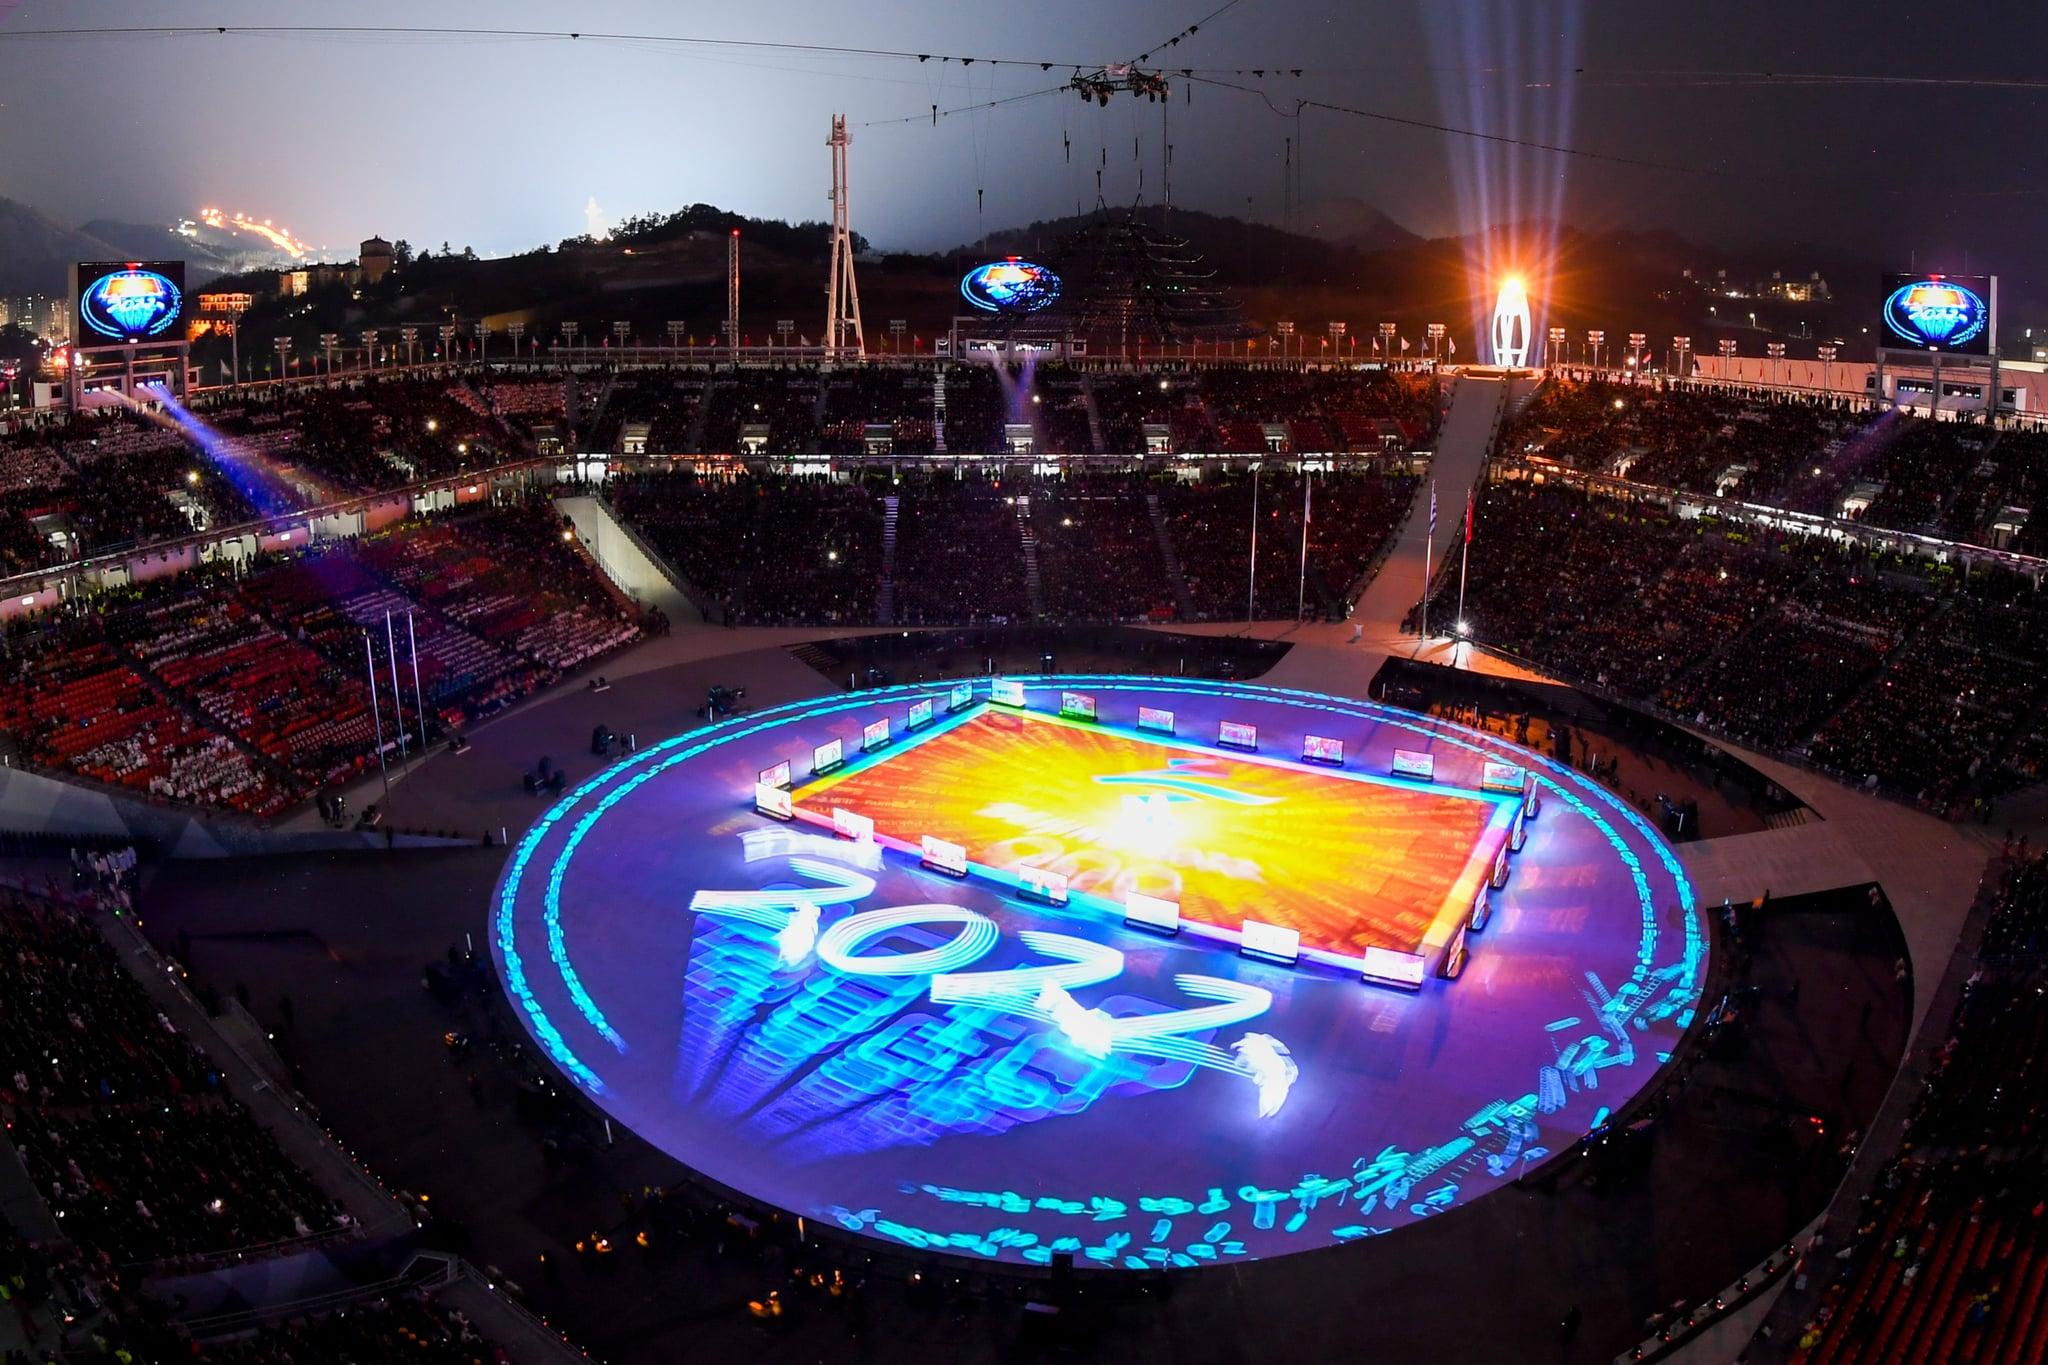 The Beijing Winter Olympics